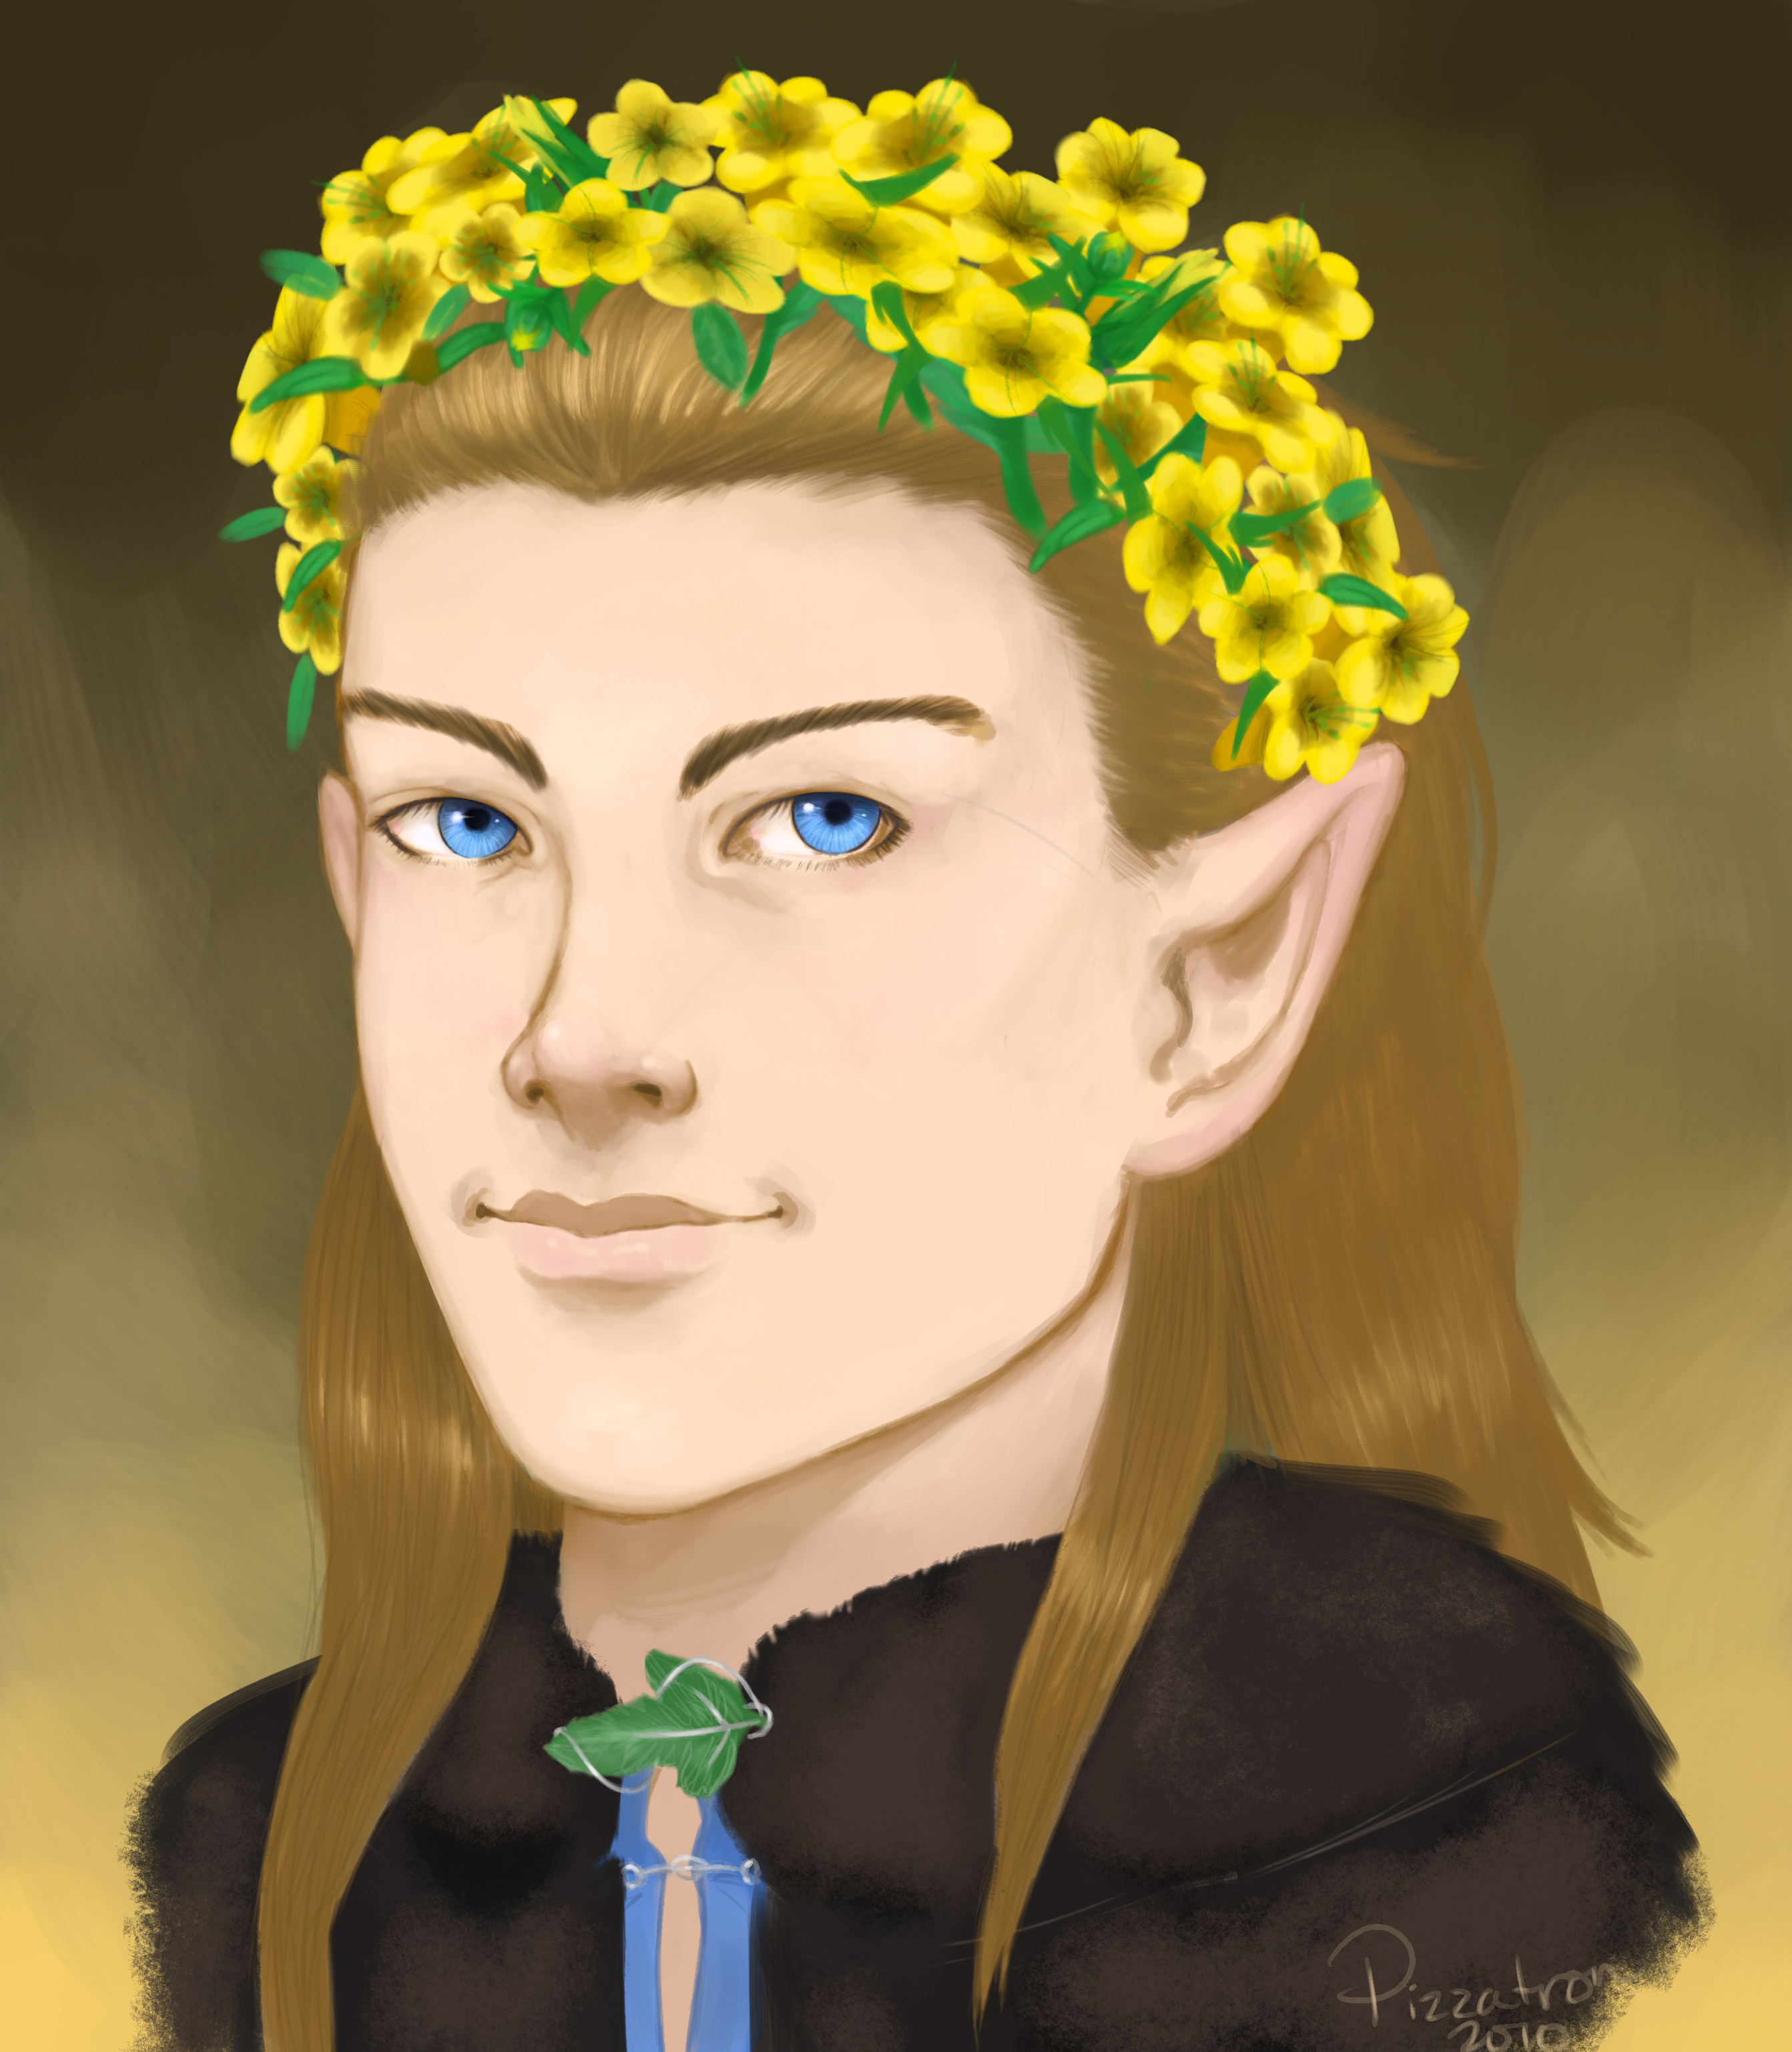 Legolas Commission for Random-Hylian